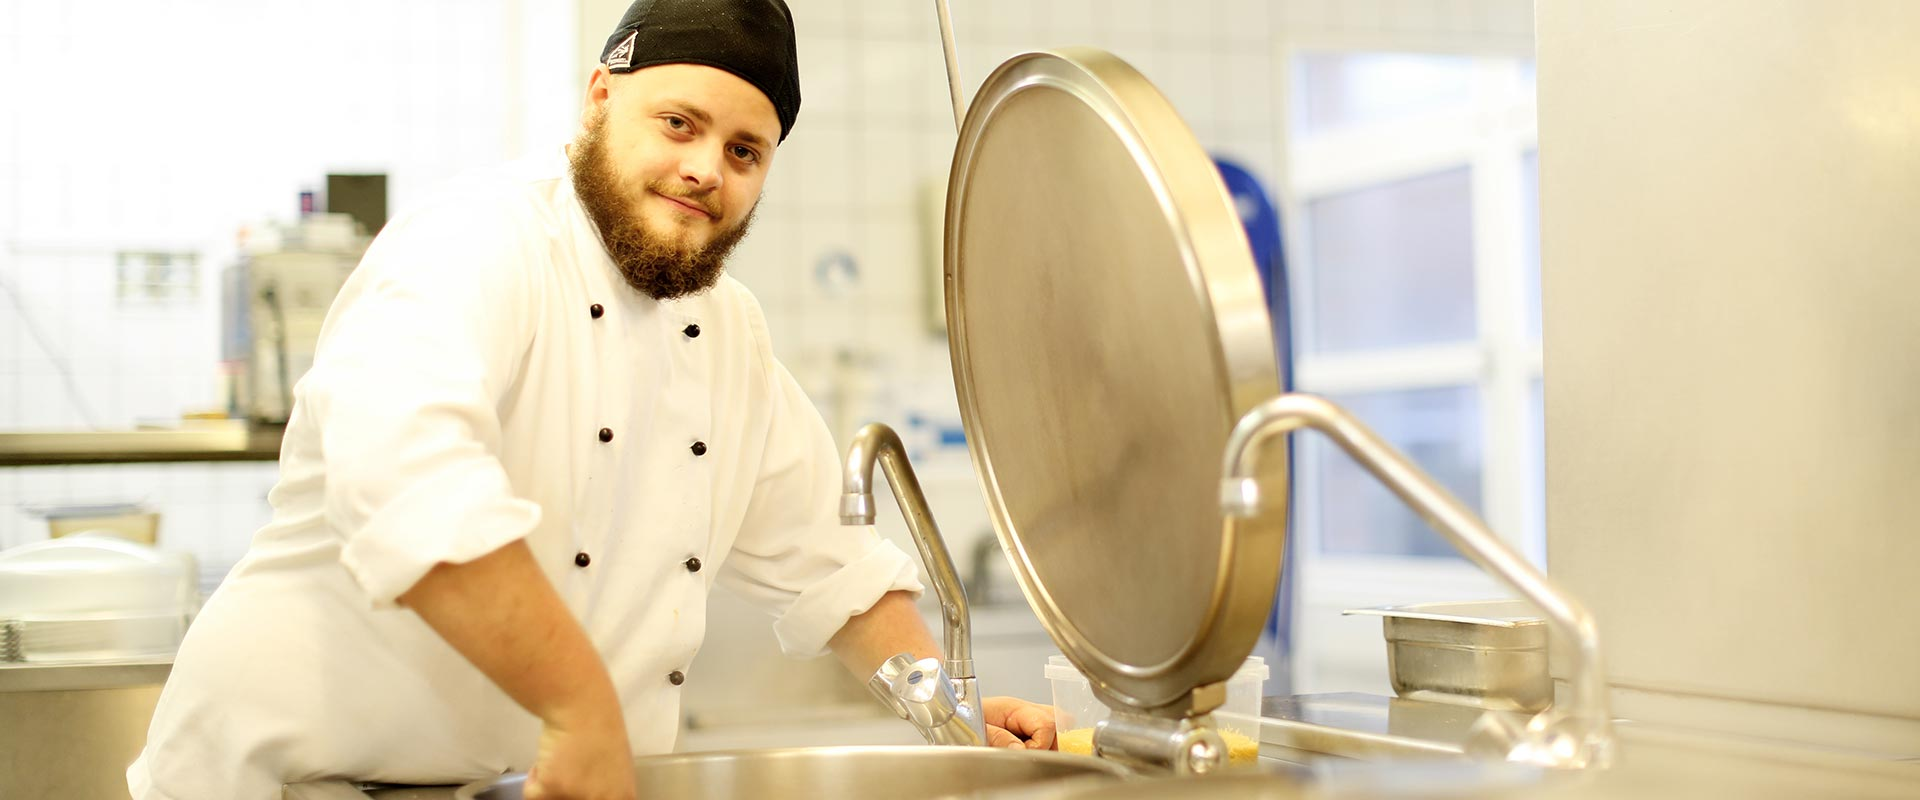 Koch in der MEDIAN Klinik Wilhelmshaven